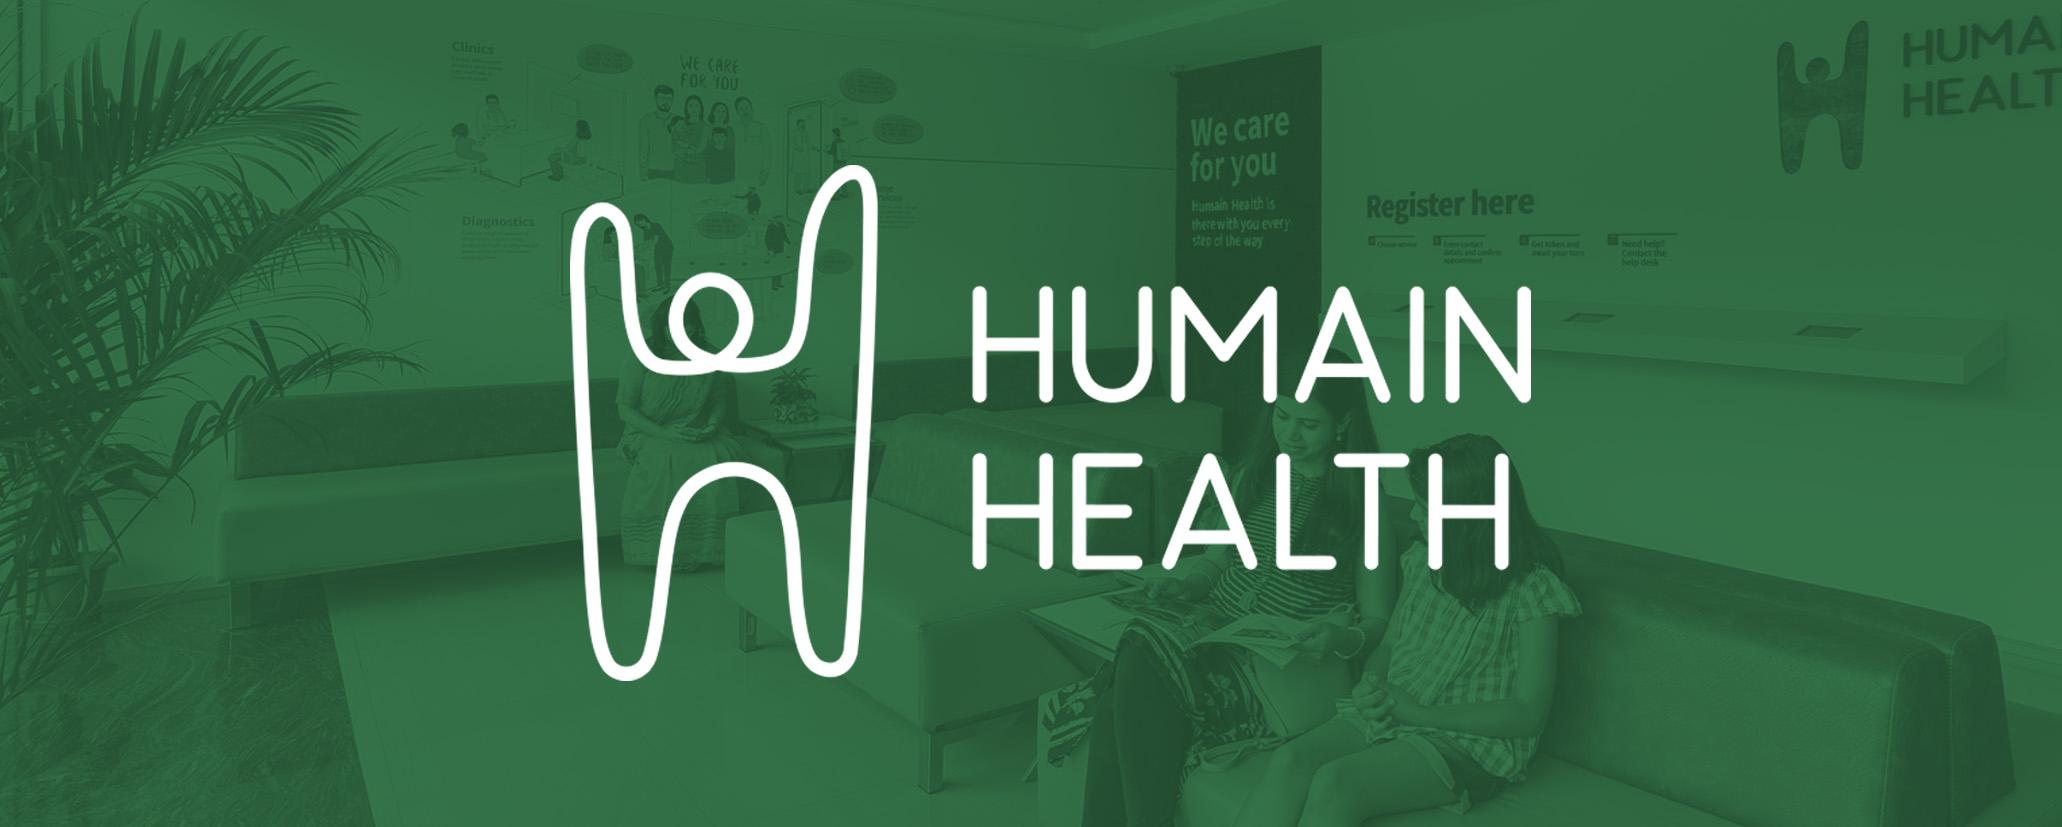 Healthcare Humain Health Rezonant Intro 02